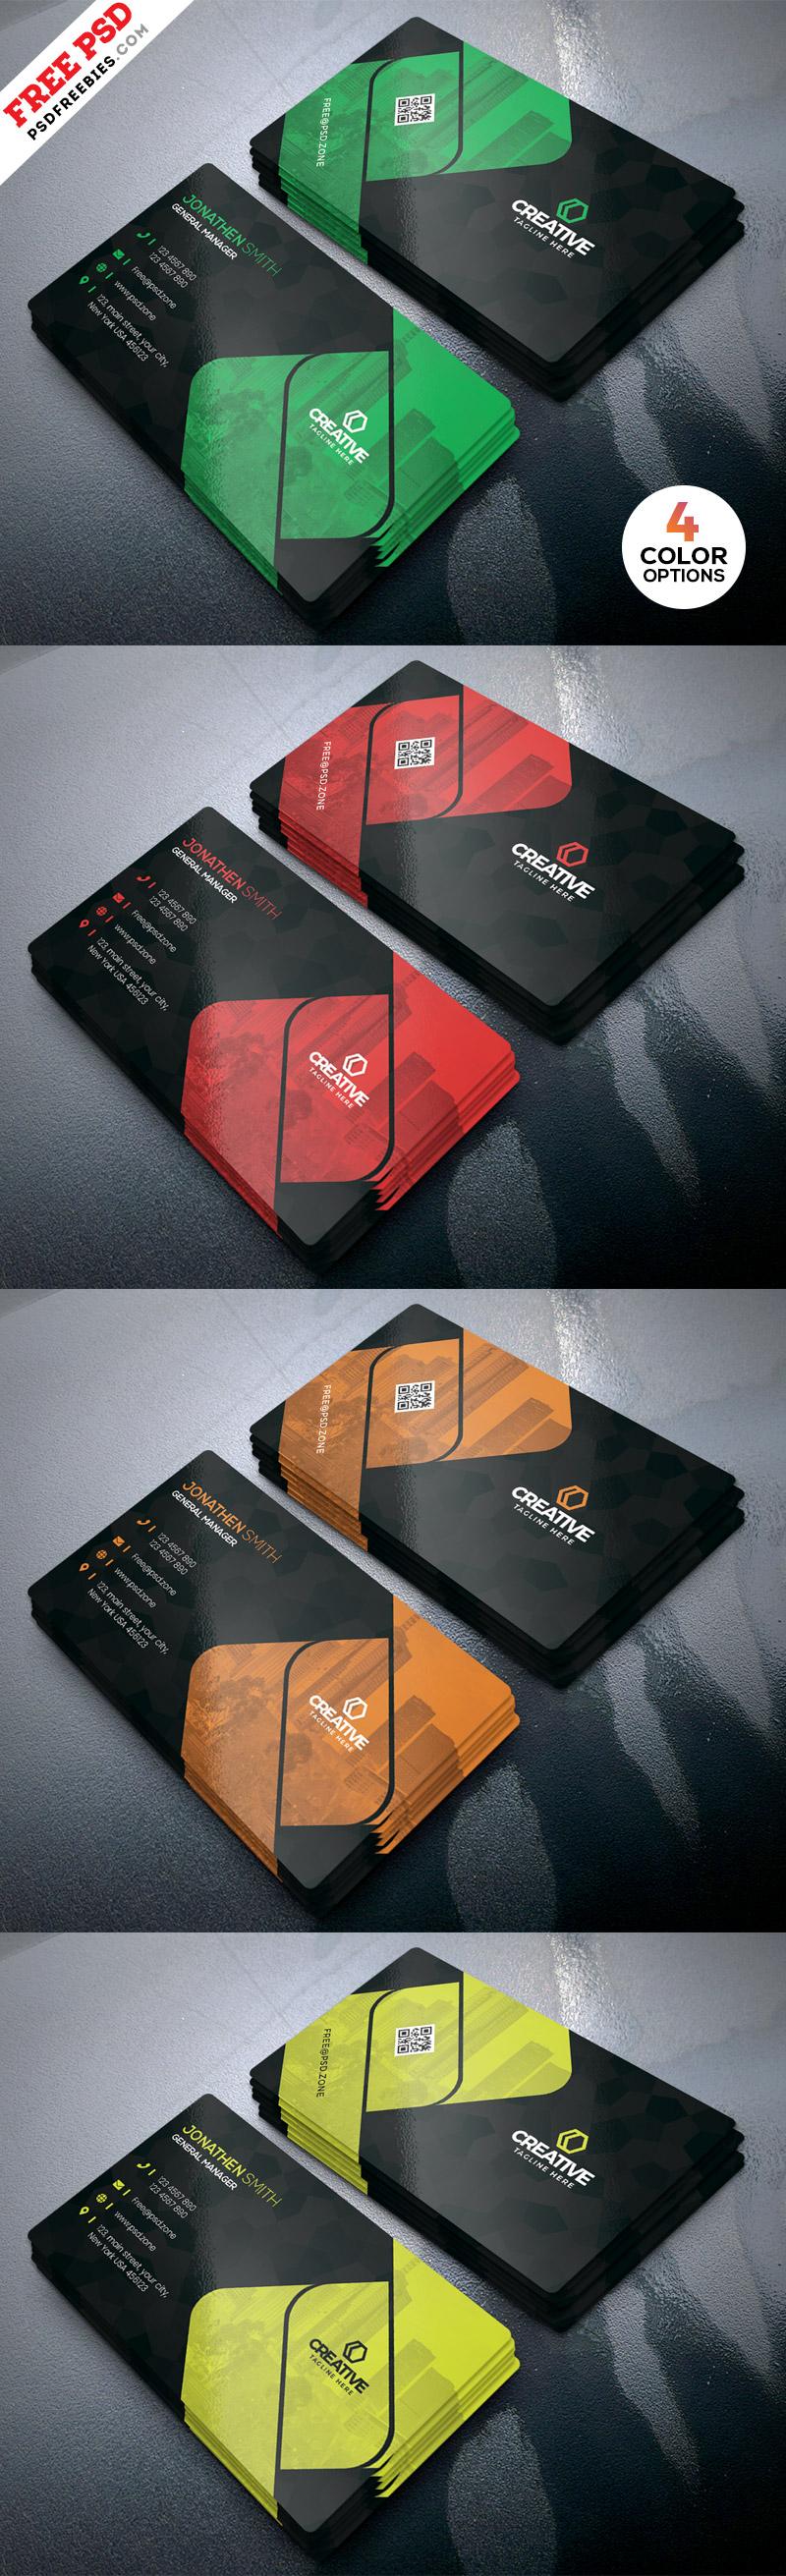 Creative Business Cards Design PSD Template